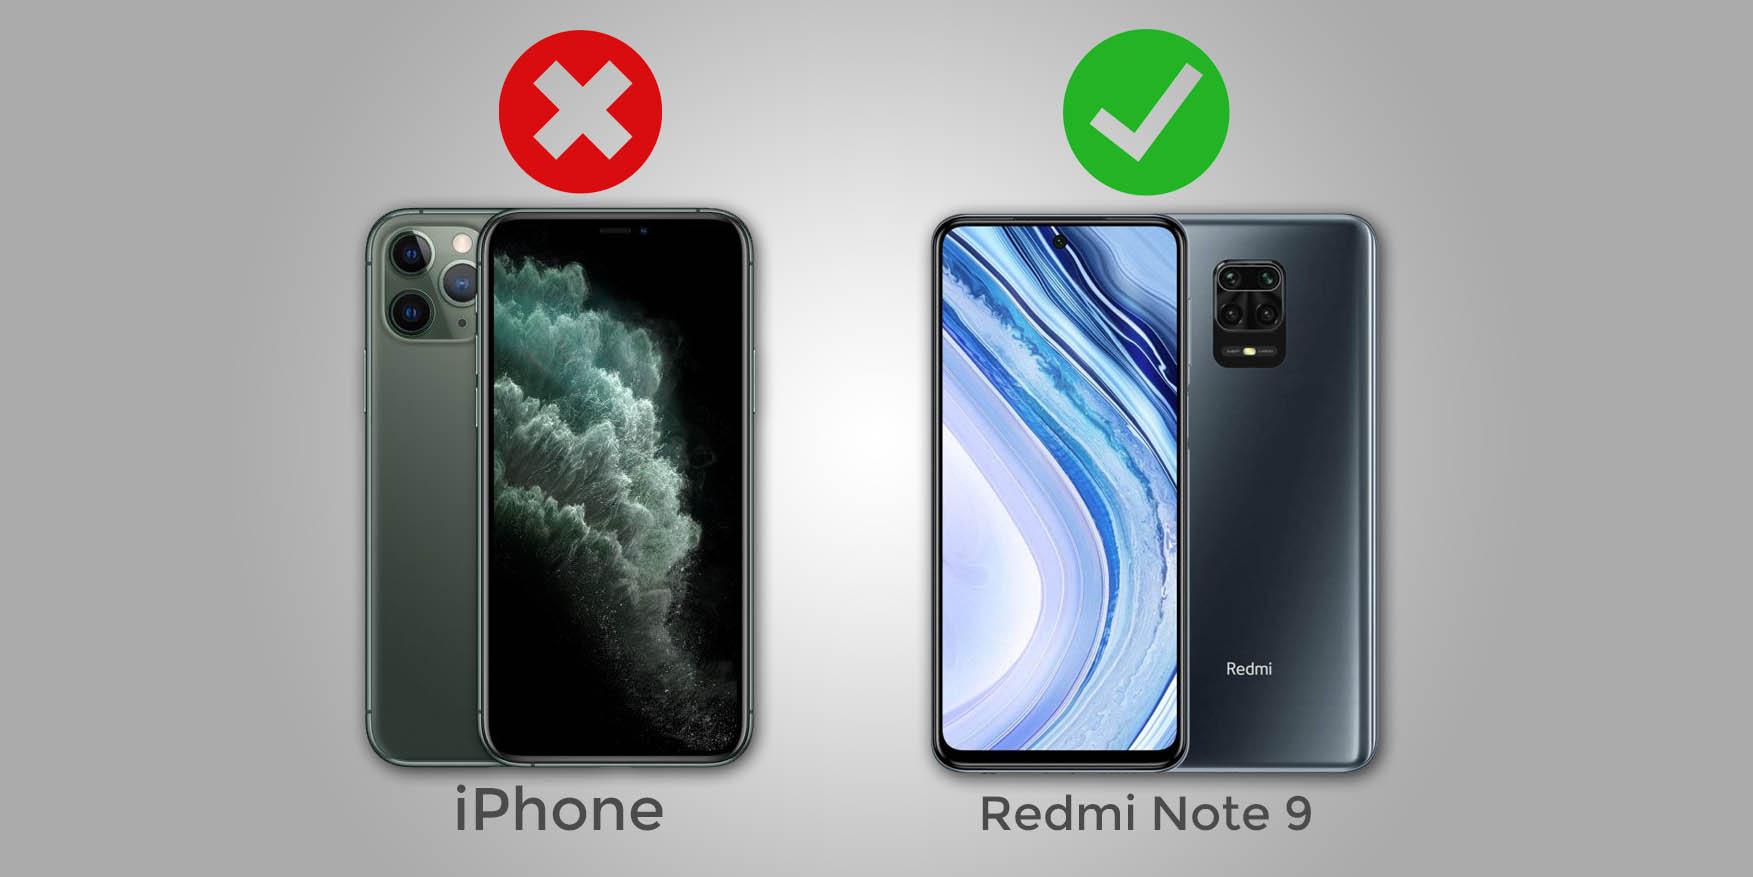 iPhone Lewat!! Ini Kelebihan dan Kekurangannya Redmi Note 9